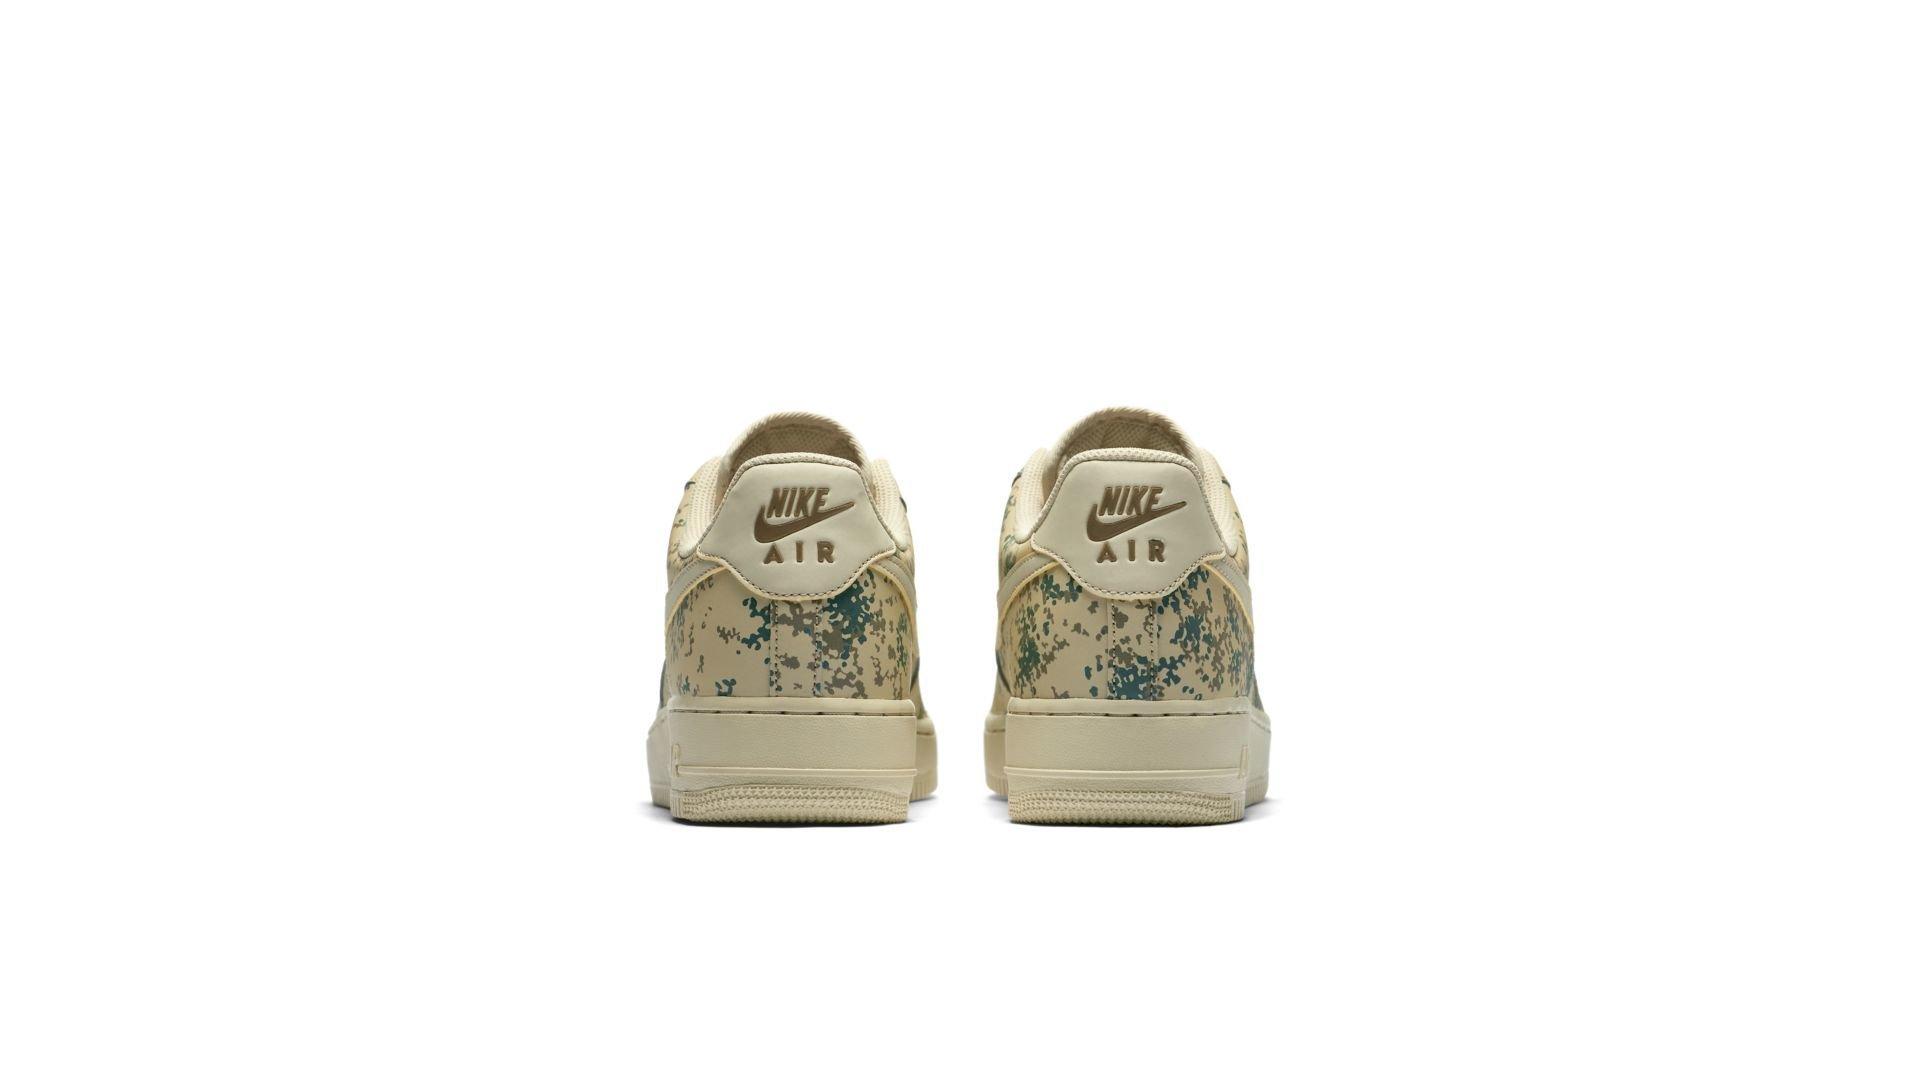 Nike Air Force 1 Low Desert Camo Team Gold (823511-700)